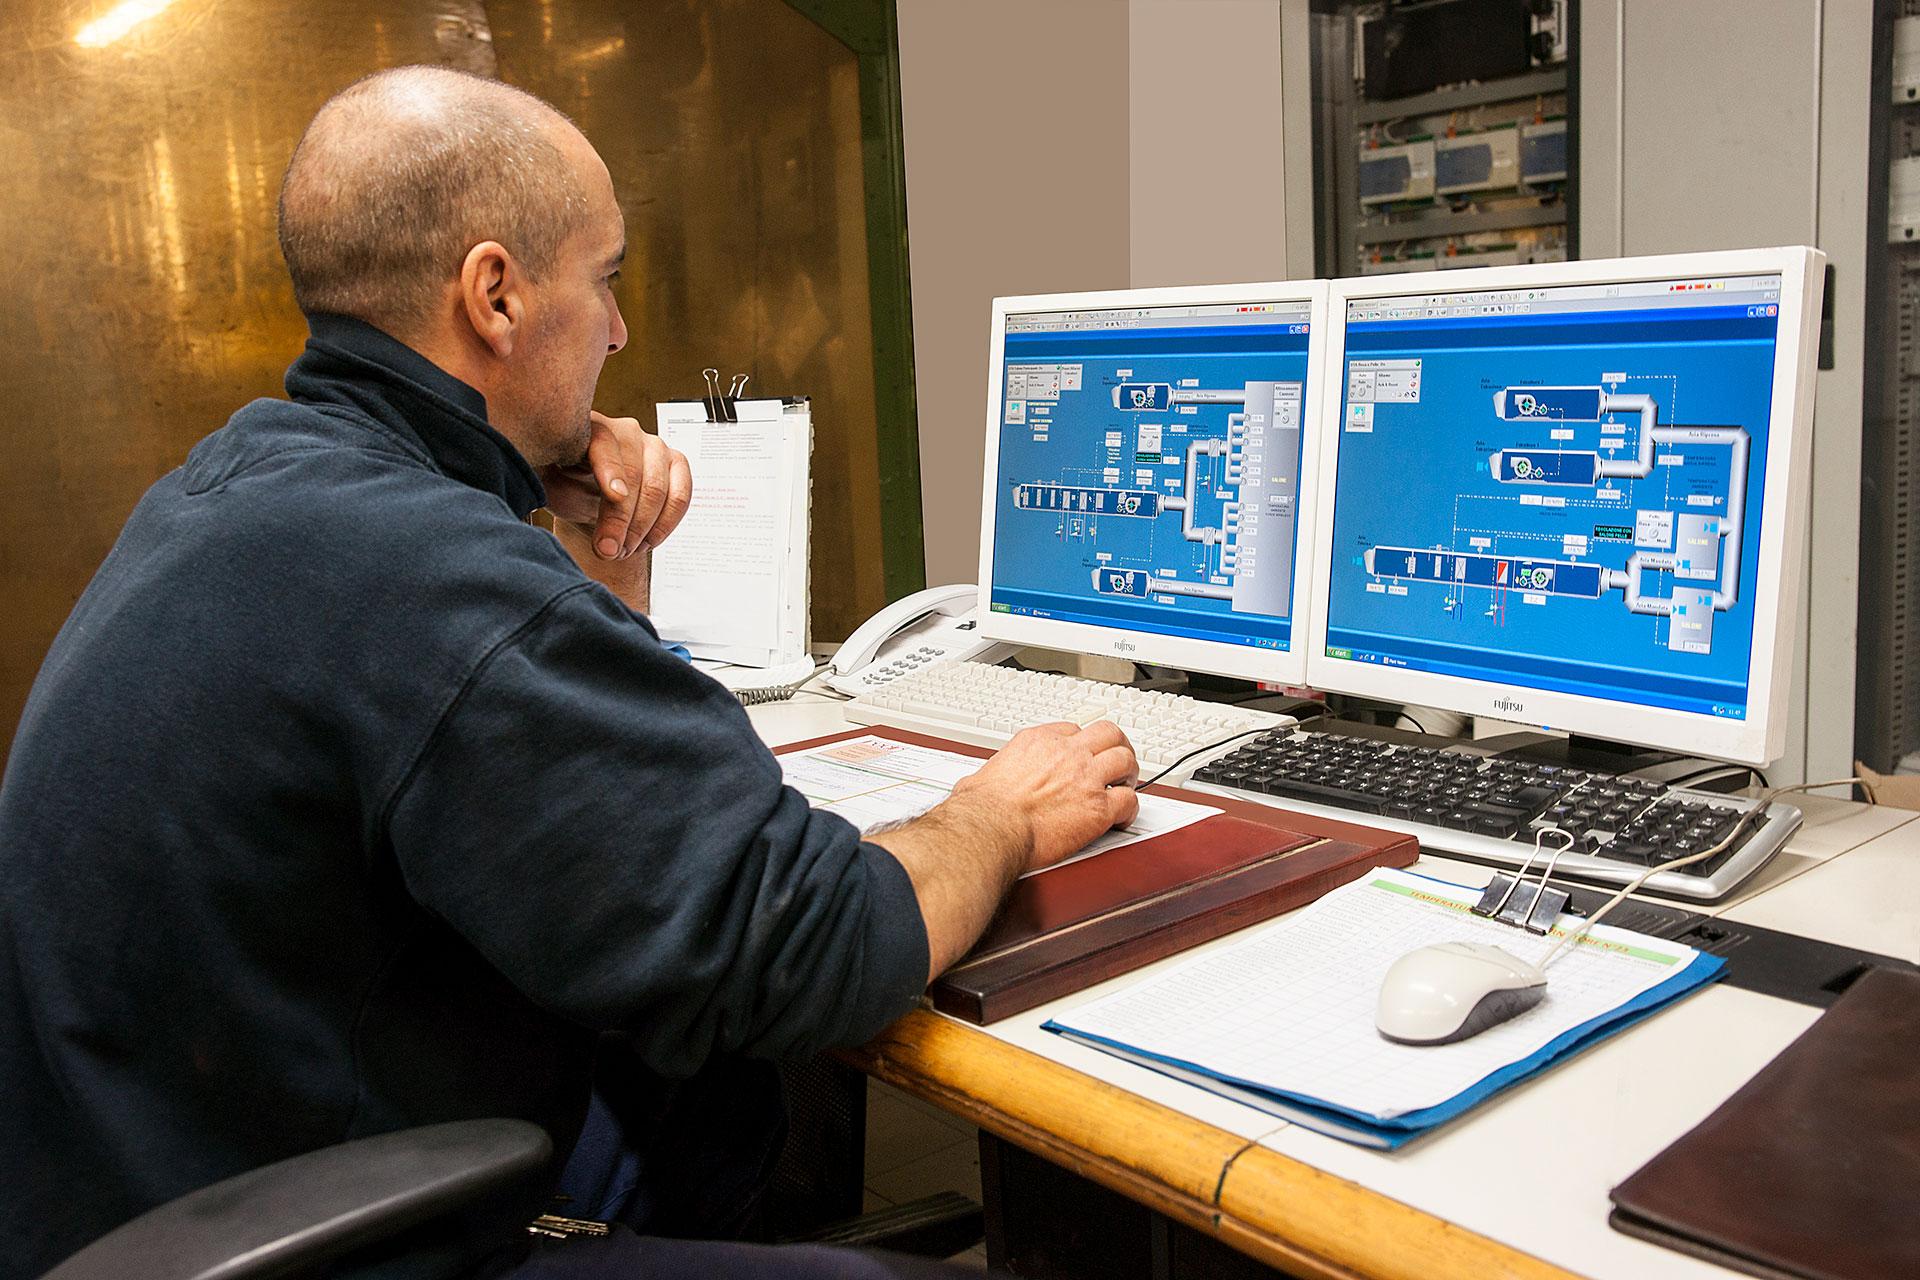 sistema di telegestione impianti